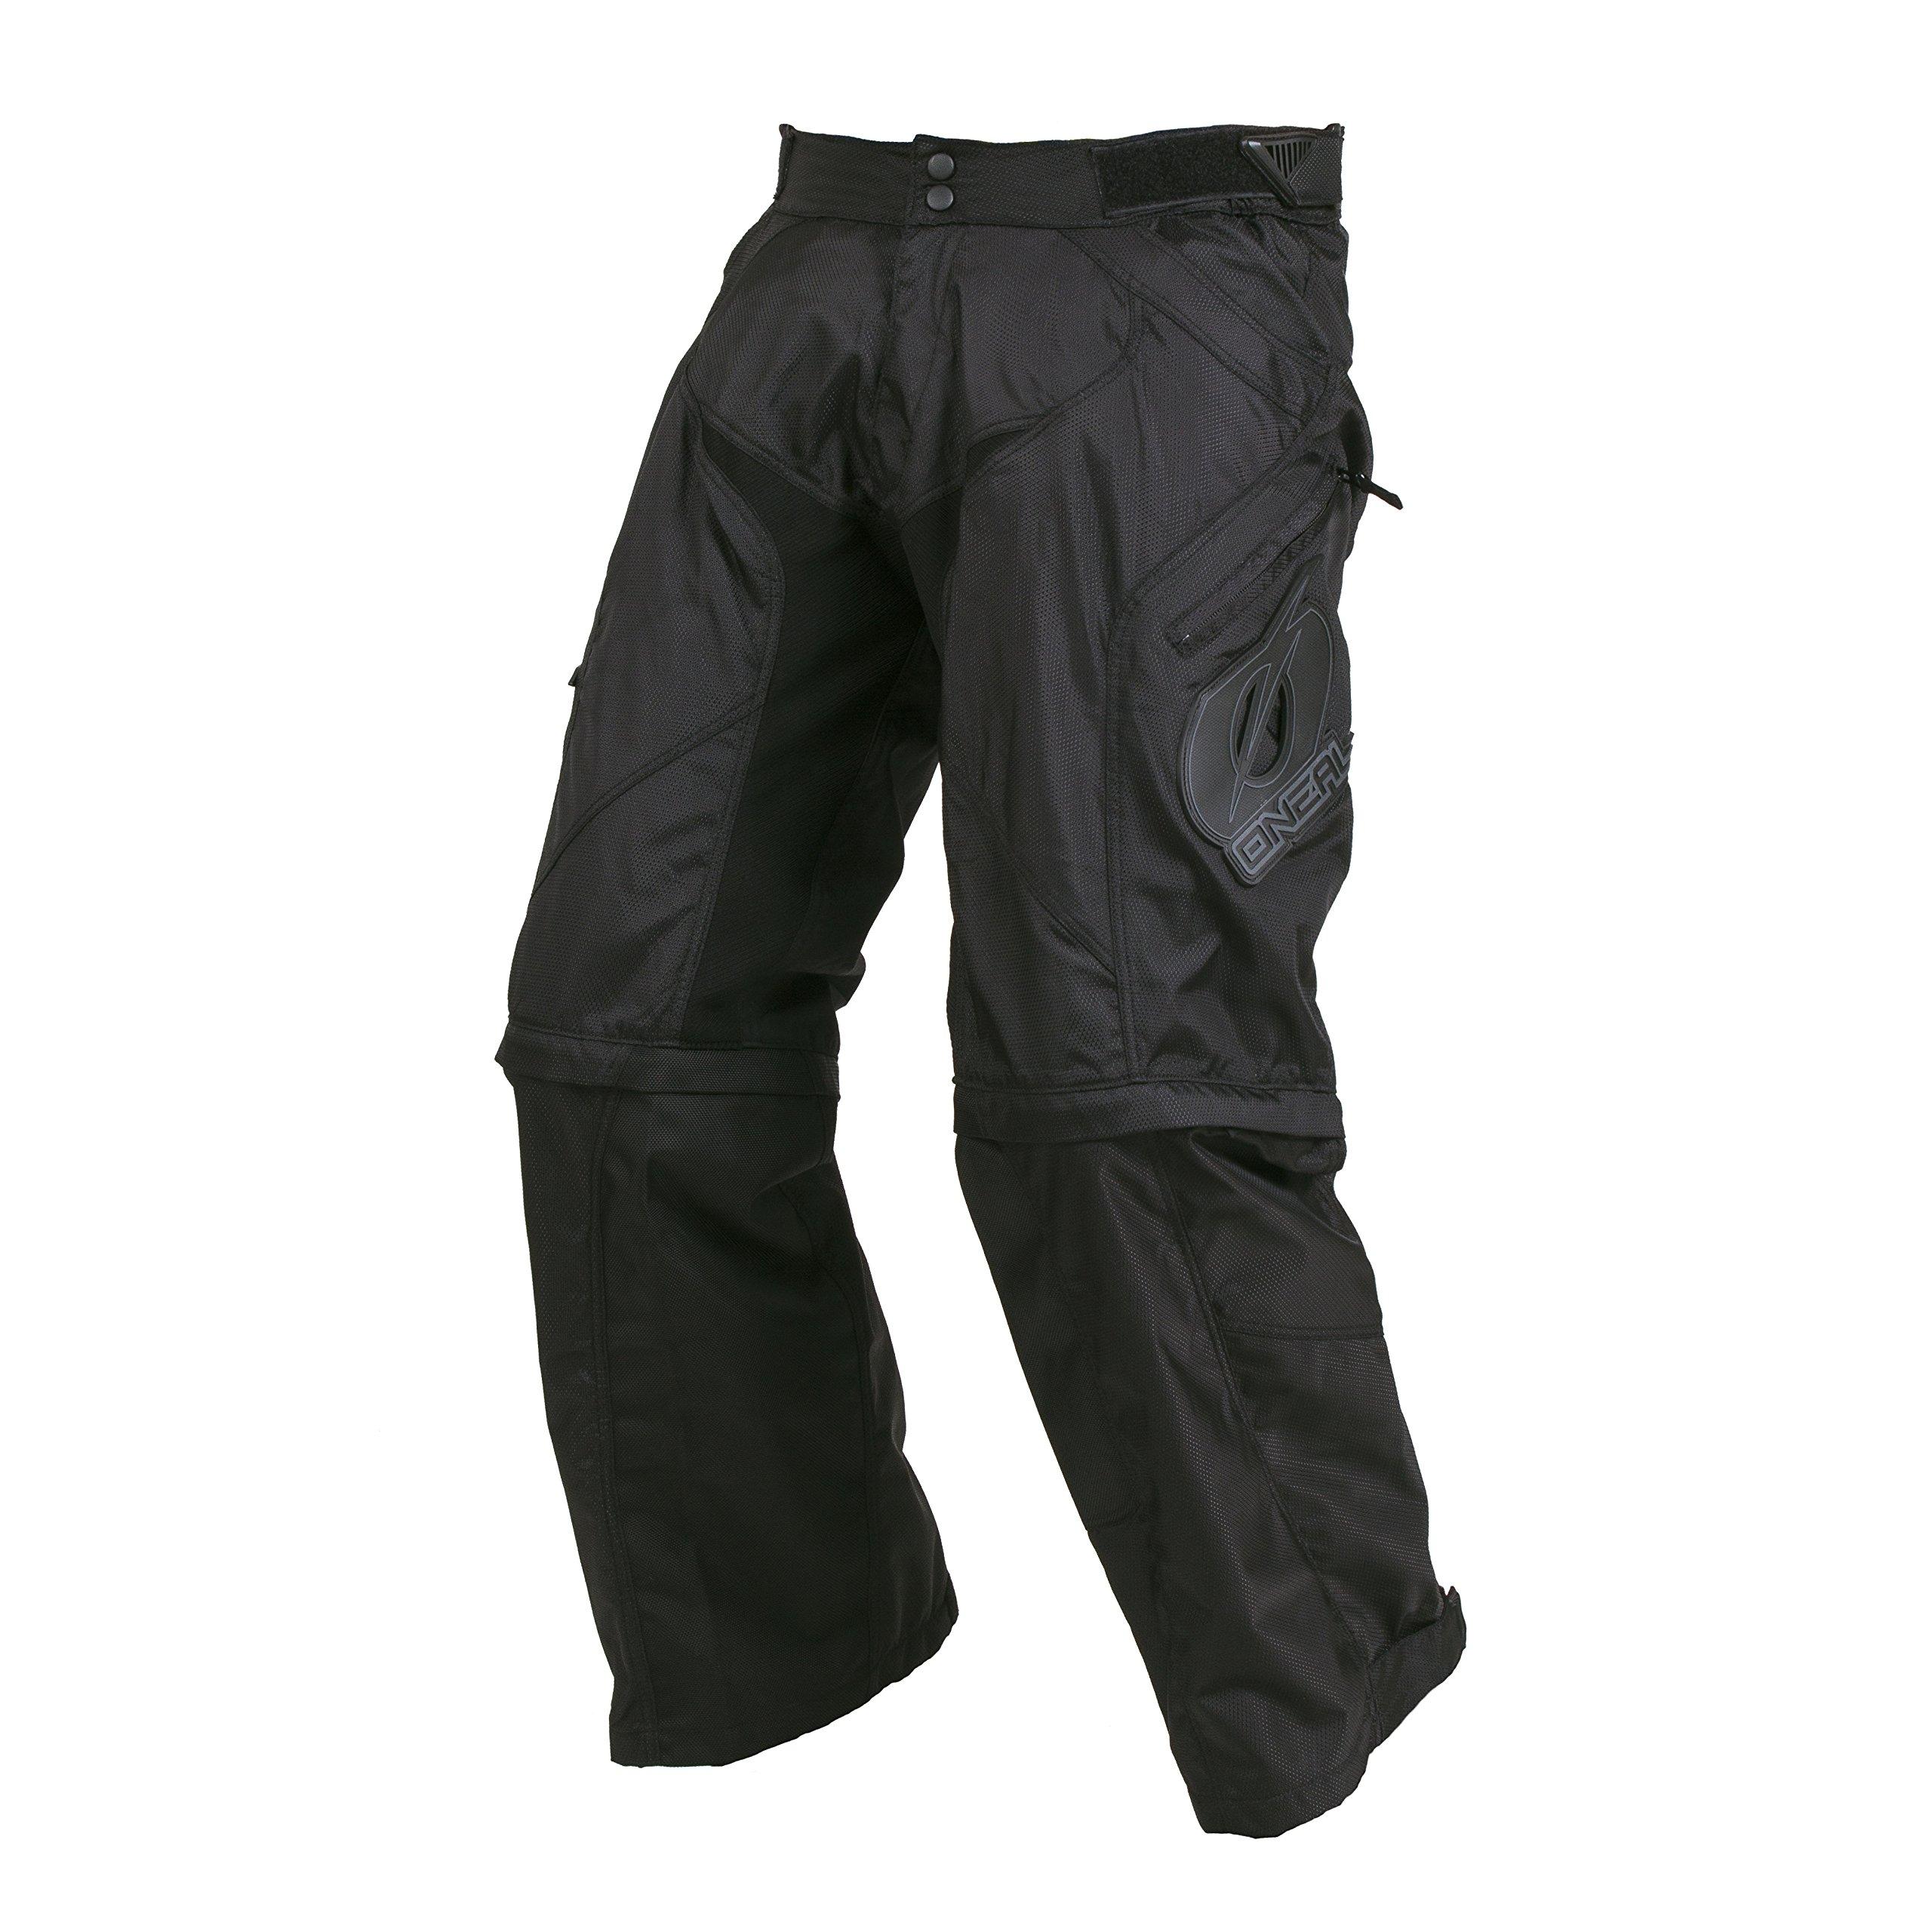 O'Neal 0134-338 Mens Apocalypse Pant(Black, Size 38) by O'Neal (Image #1)